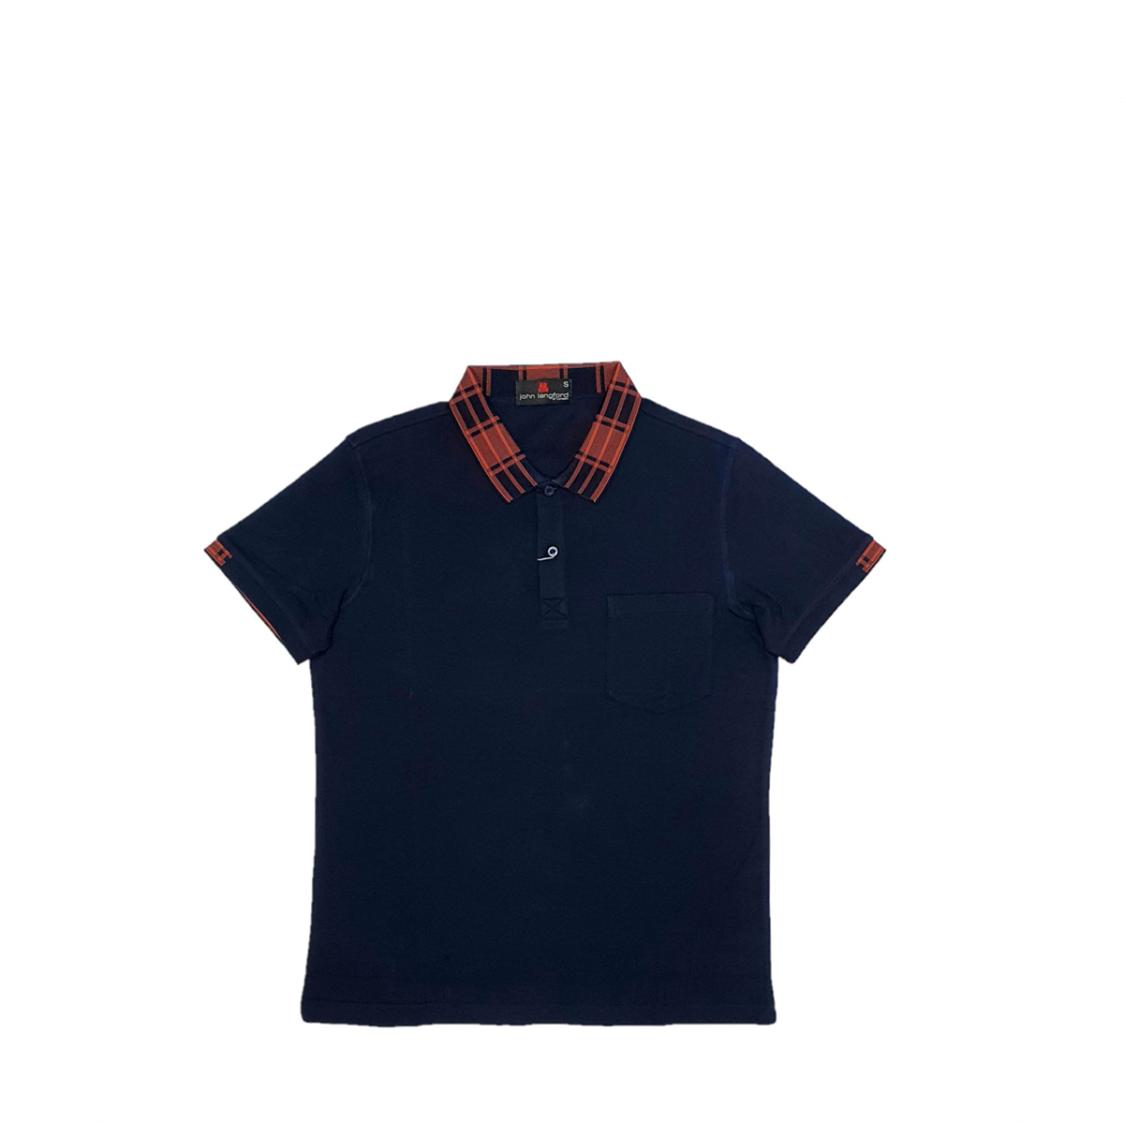 John Langford Honeycombed Polo T-Shirt with Pocket and Digital Printed Collar Navy